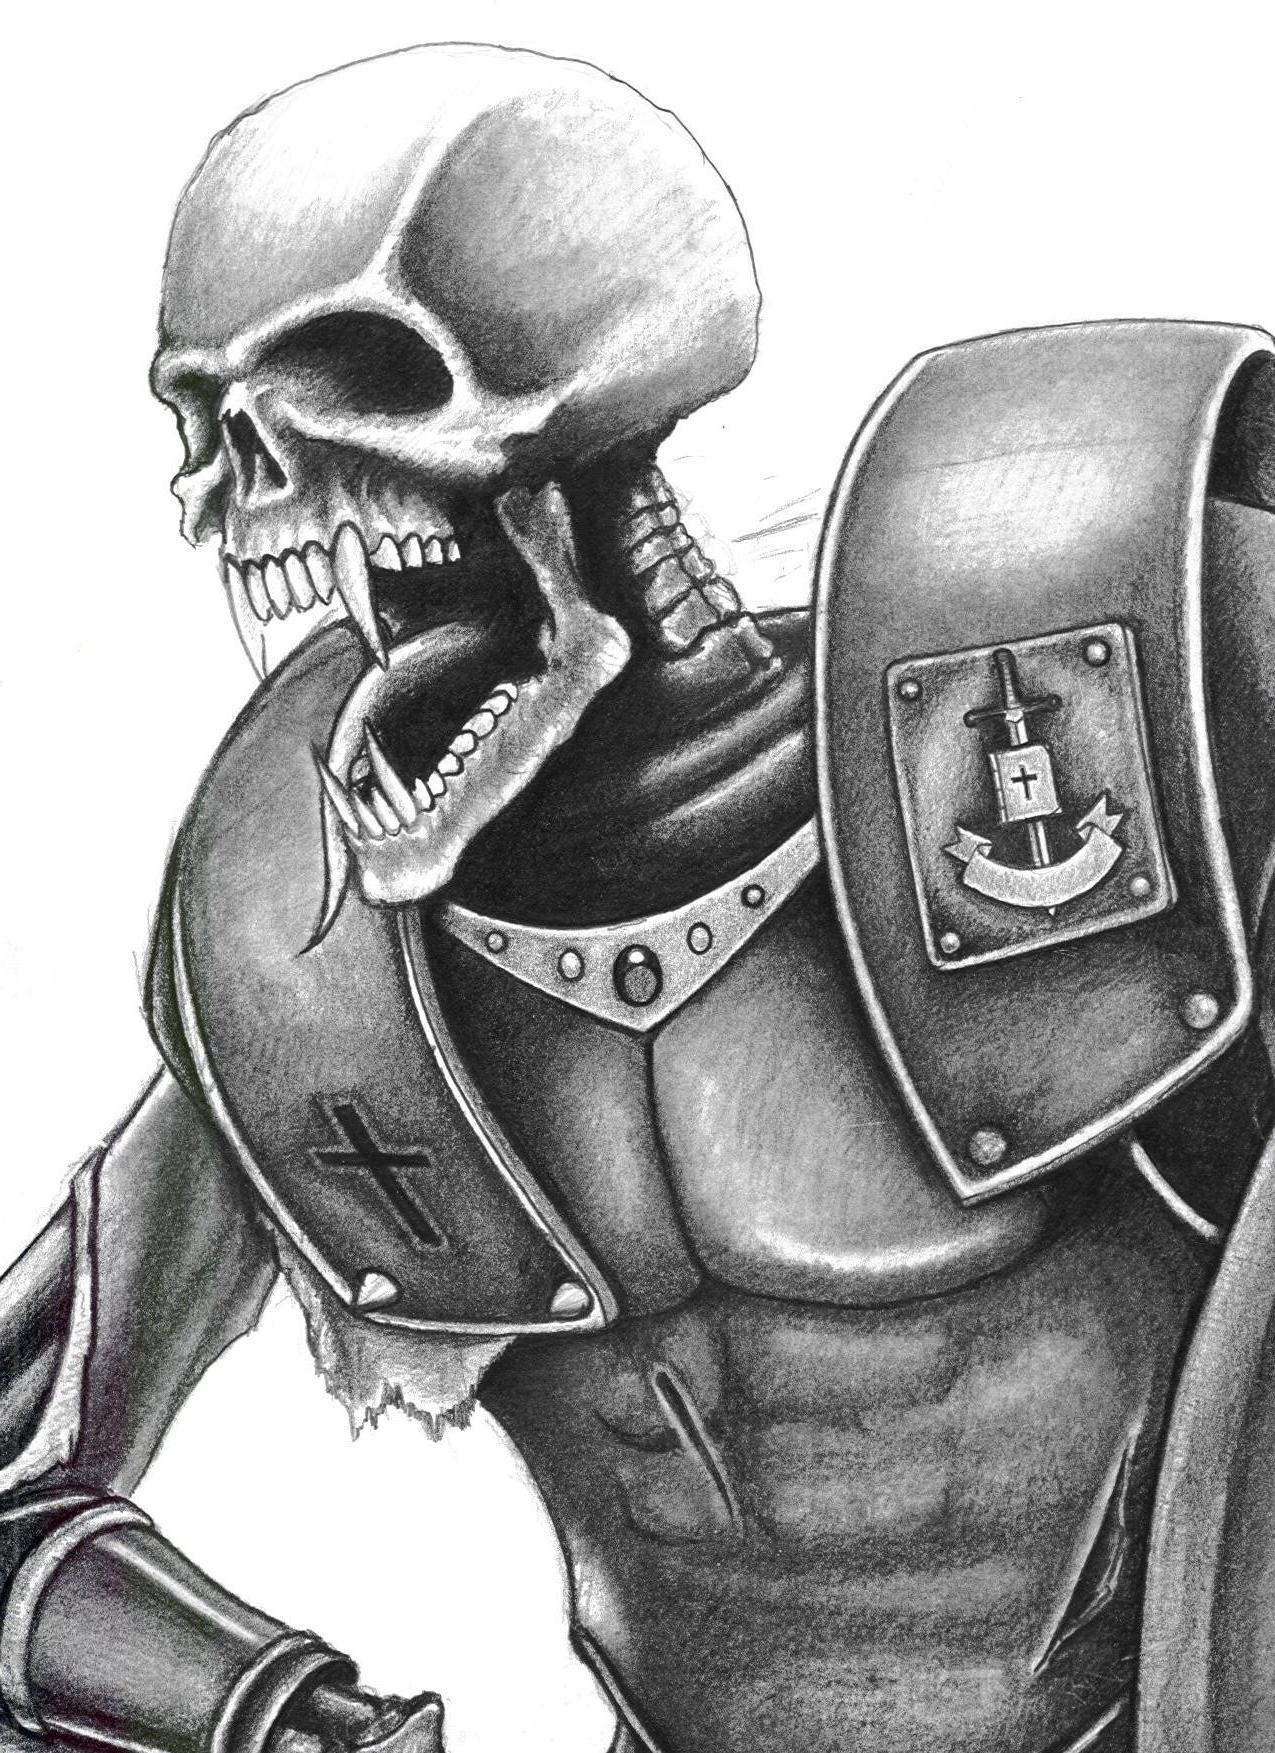 Drawn skeleton skeleton warrior Naffermike naffermike skeleton warrior naffermike